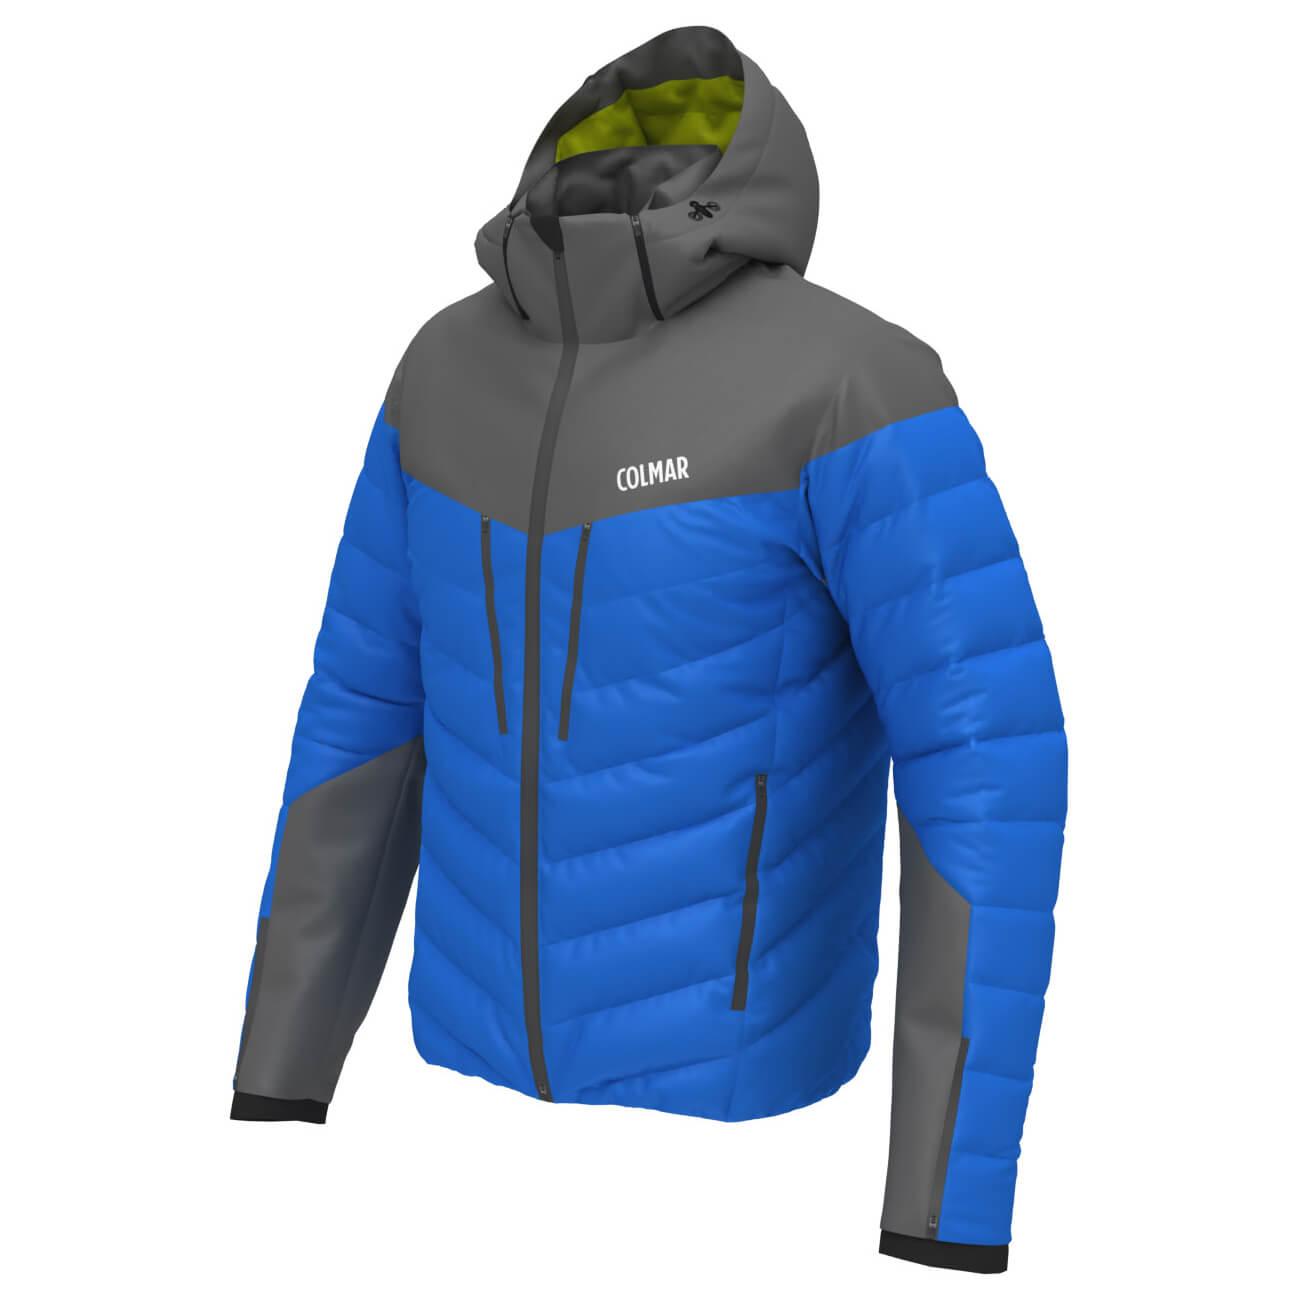 colmar active colmar sapporo chamonix ski jacket men 39 s free uk delivery. Black Bedroom Furniture Sets. Home Design Ideas